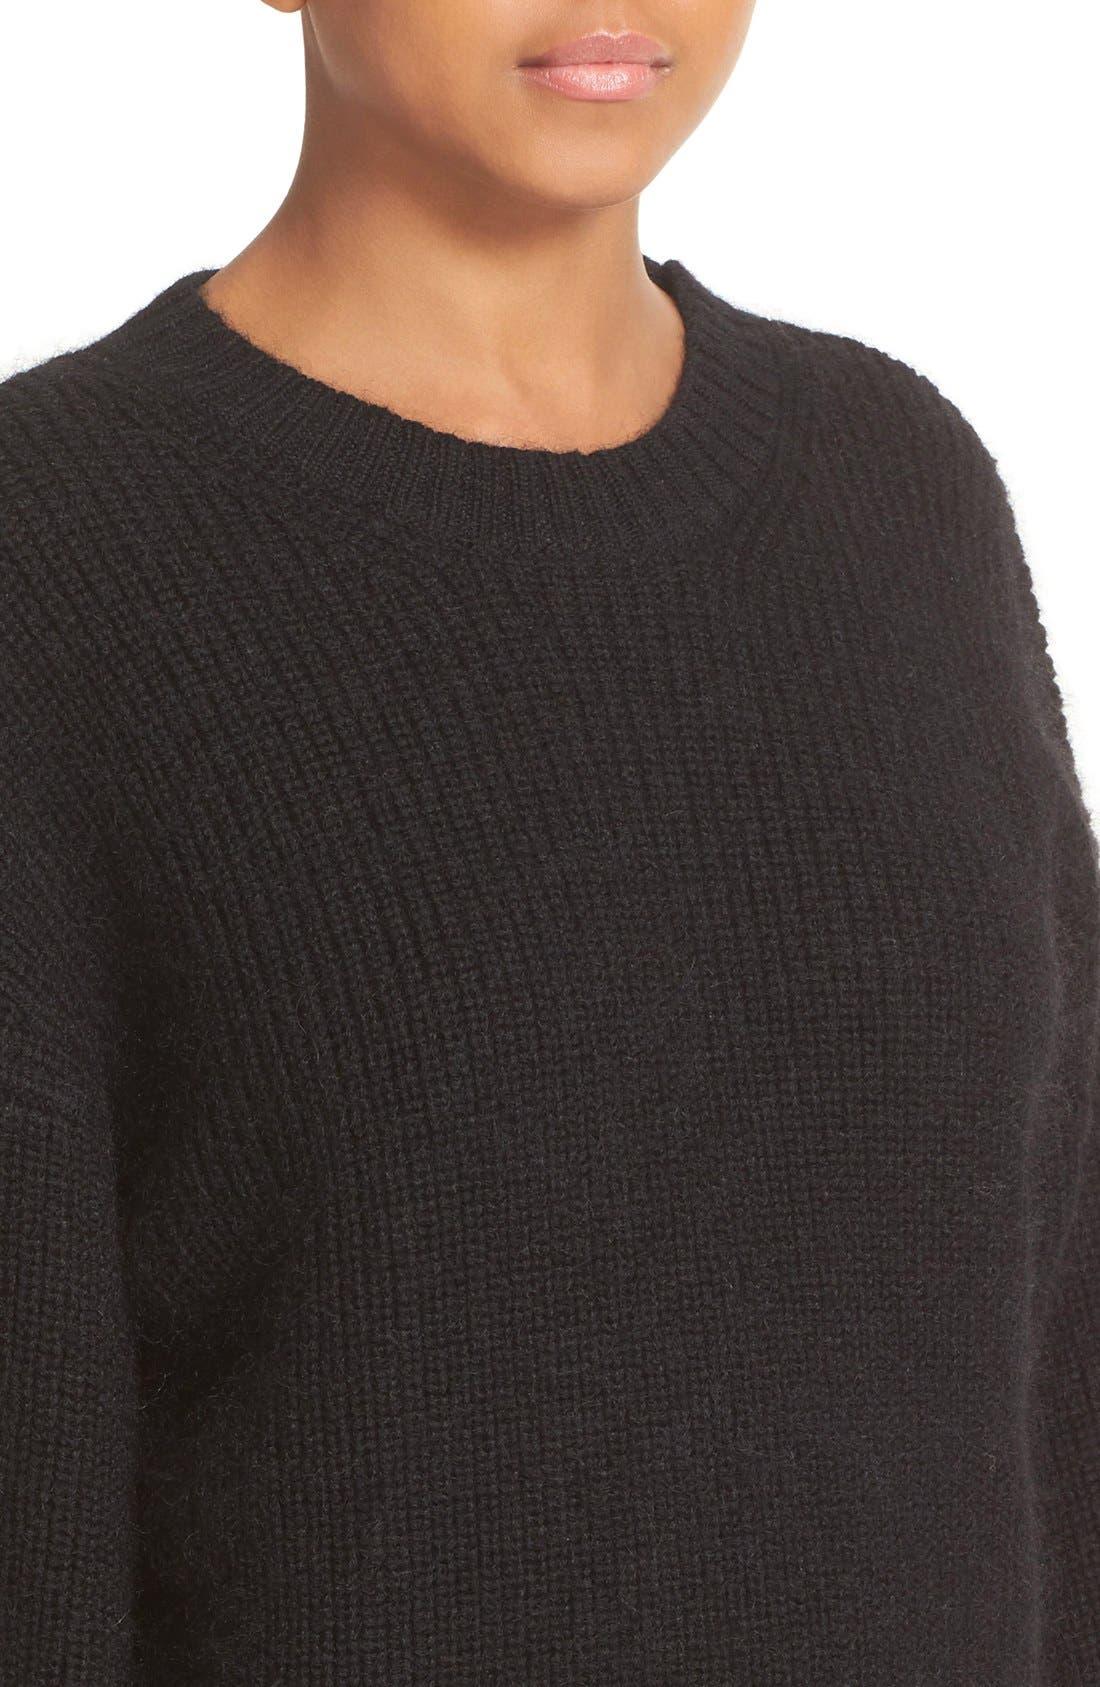 Alternate Image 5  - 3.1 Phillip Lim Rib Knit Wool Blend Sweater